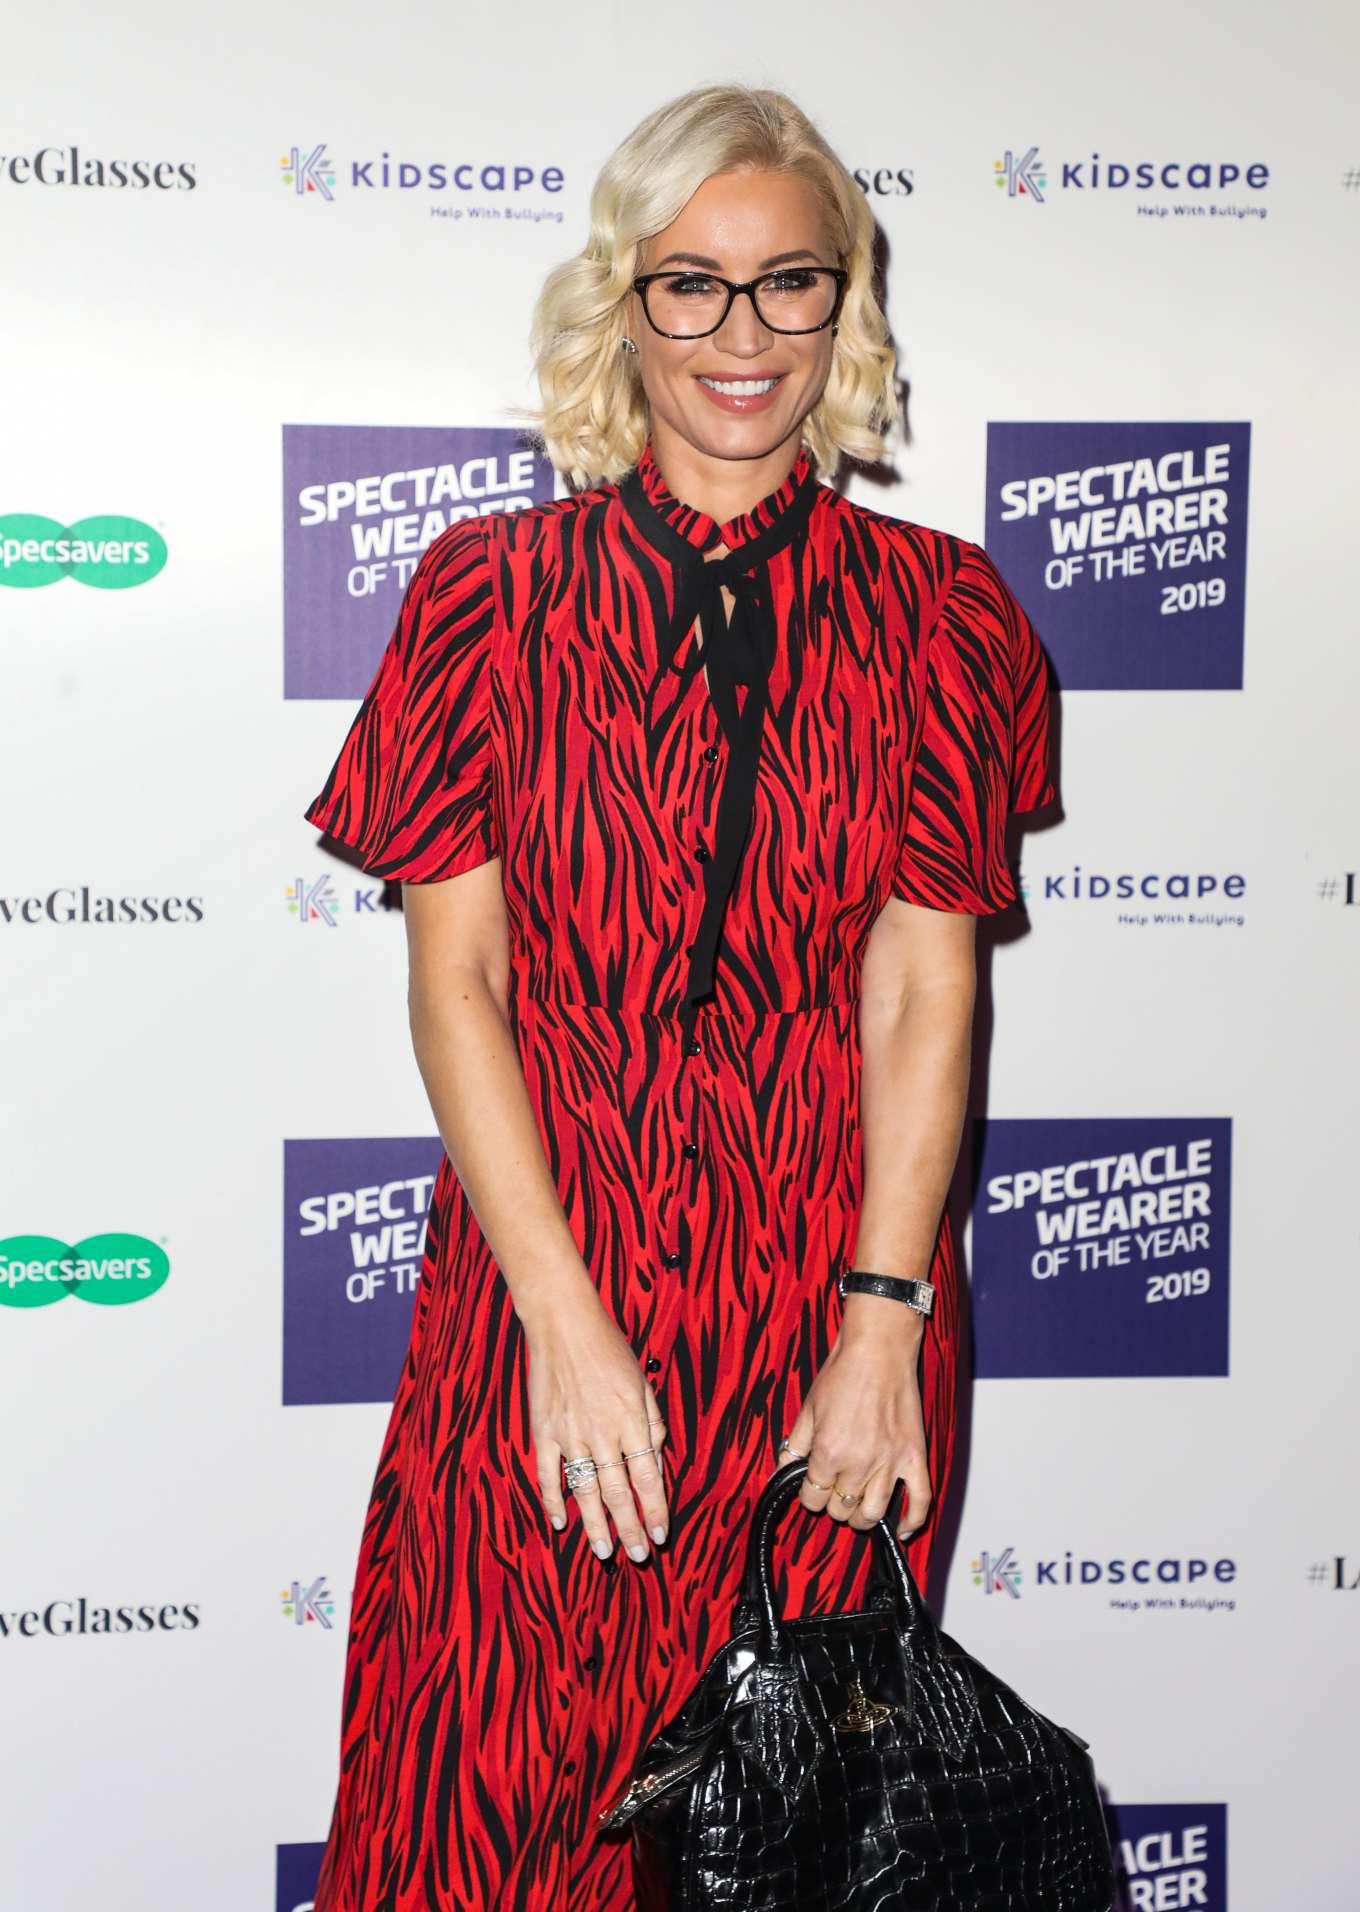 Denise Van Outen 2019 : Denise Van Outen – Specsavers Spectacle Wearer of the Year Awards 2019-01